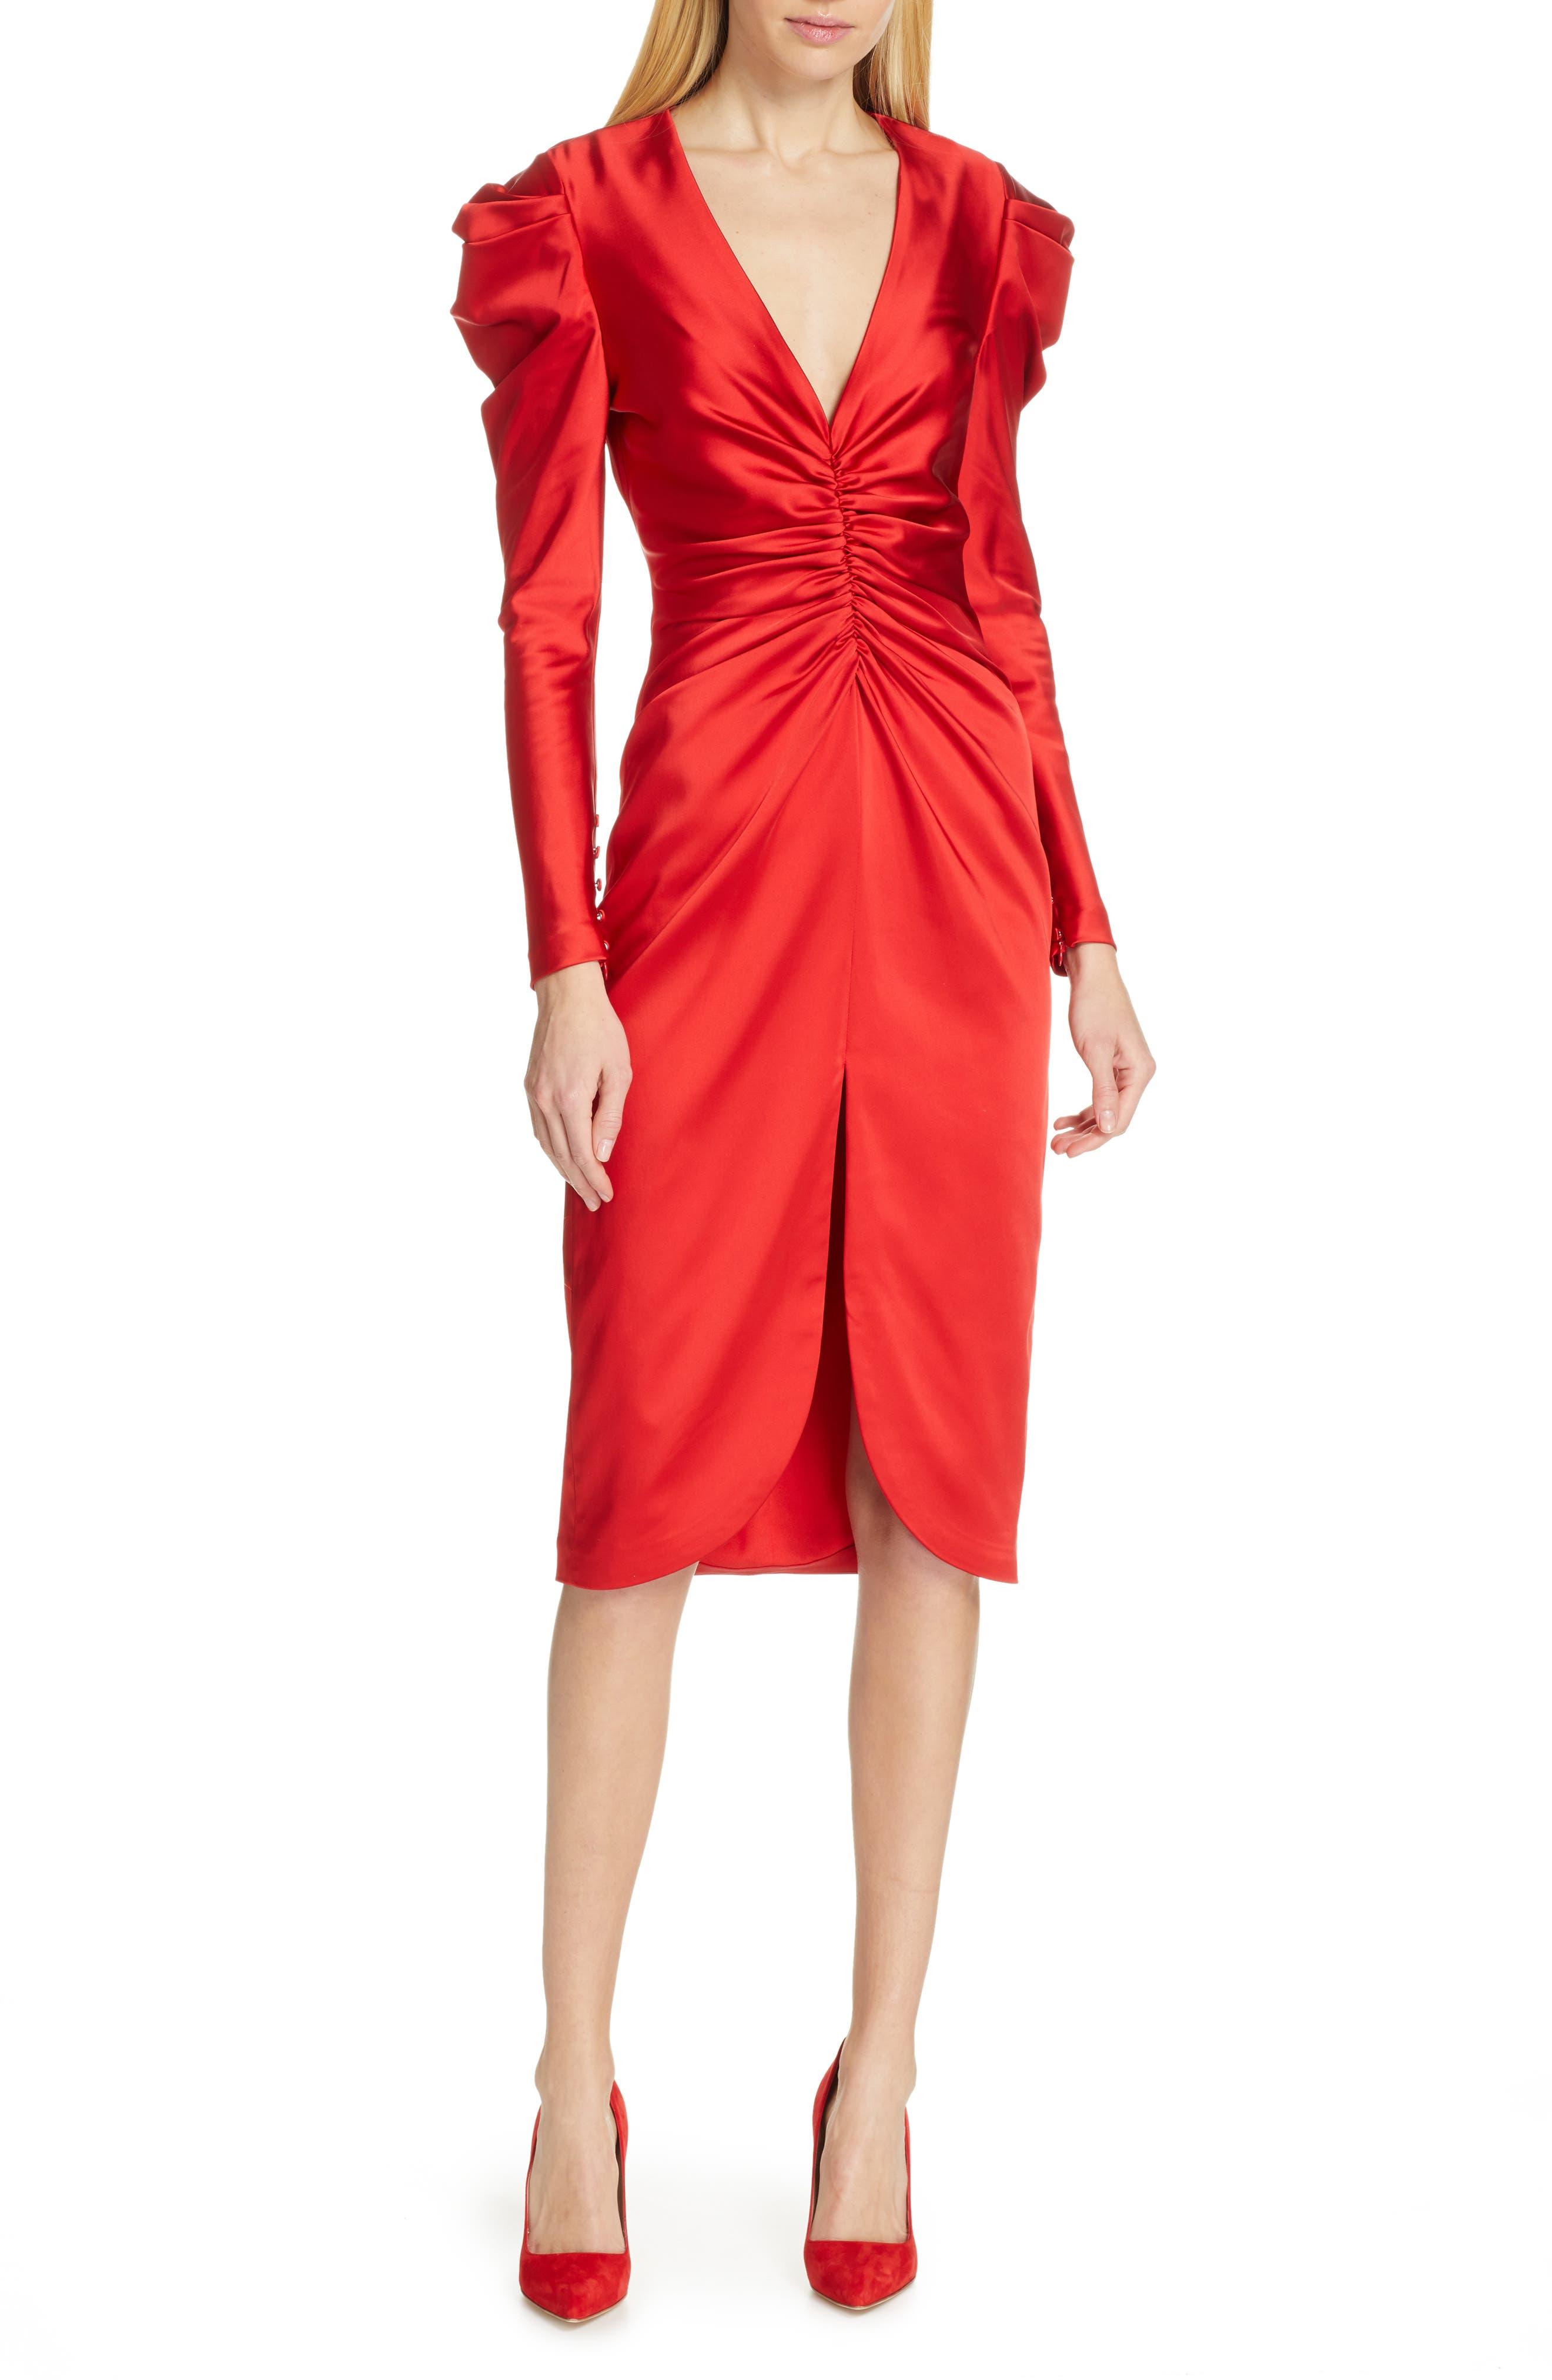 Jonathan Simkhai Ruched Satin Midi Dress, Red